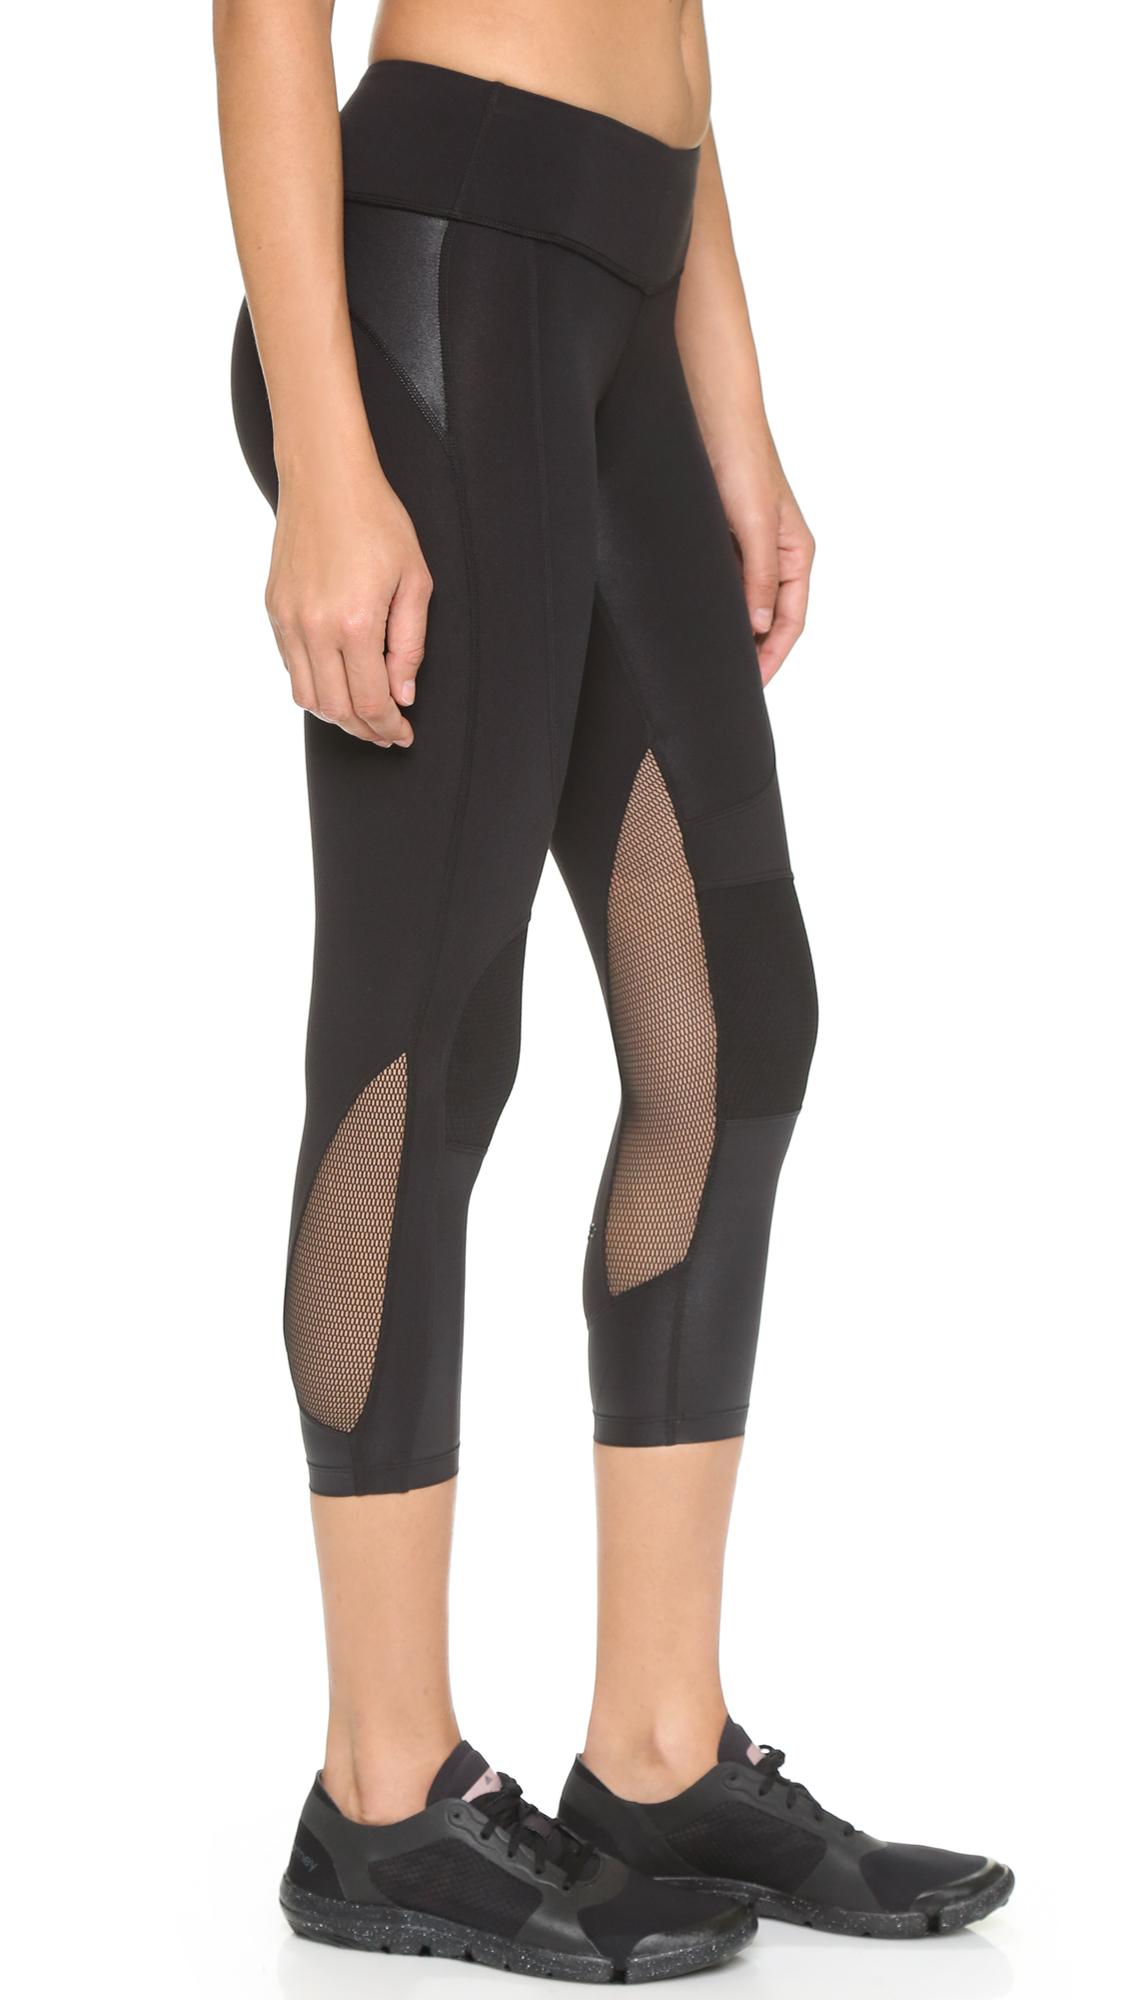 0edca3c6bcb45 Splits59 Matrix Noir Performance Capri Leggings - Black/eros/white in Black  - Lyst